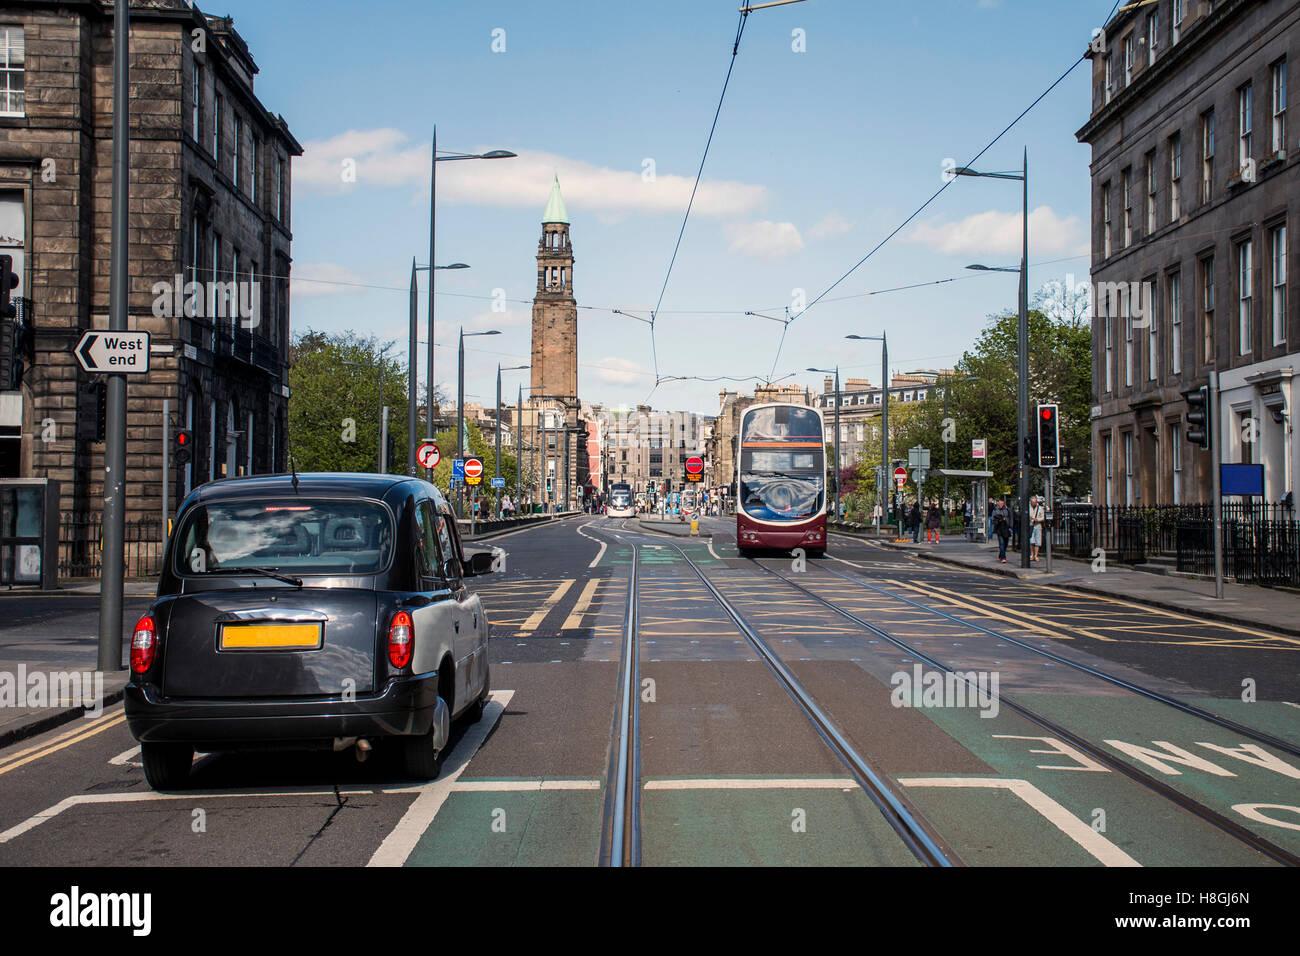 Scotland United Kingdom Edinburgh - Daily life and Taxi